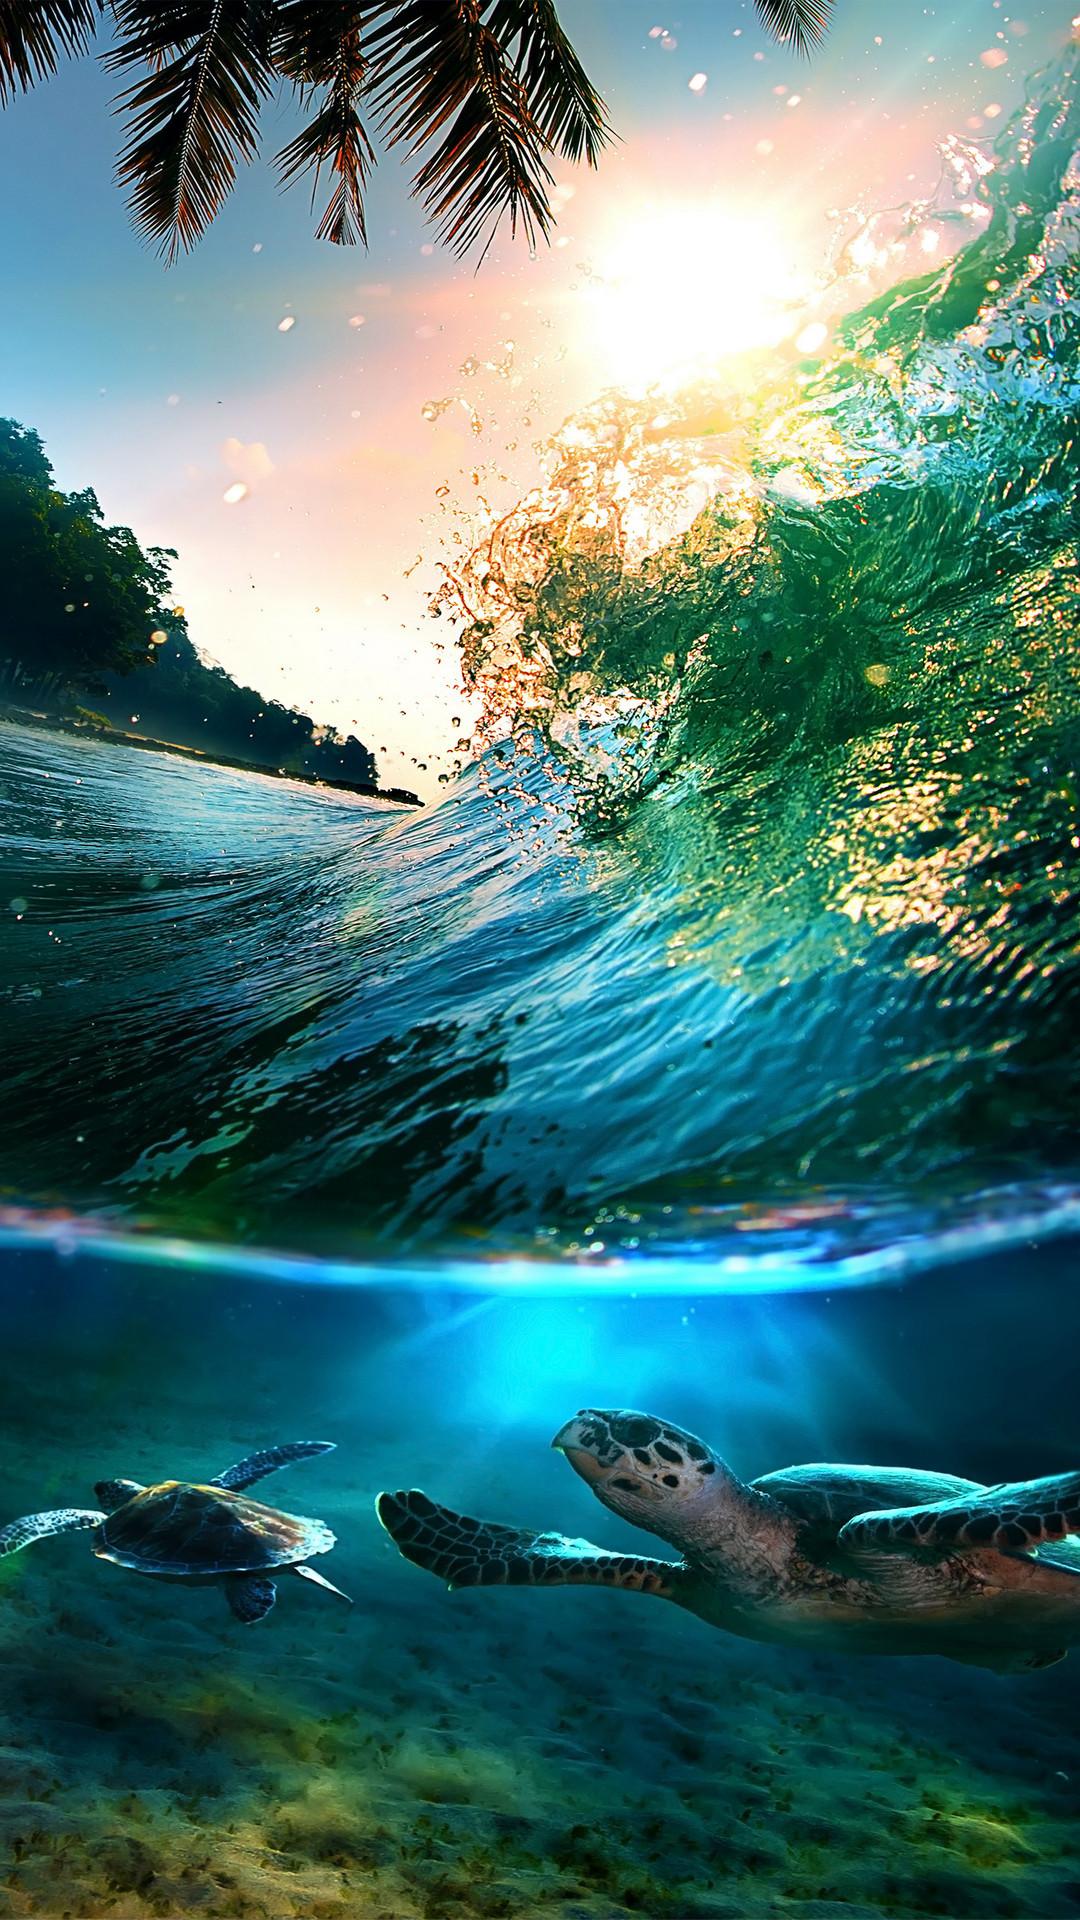 Tropical-Sea-Island-Turtles-iPhone-6-Plus-HD-